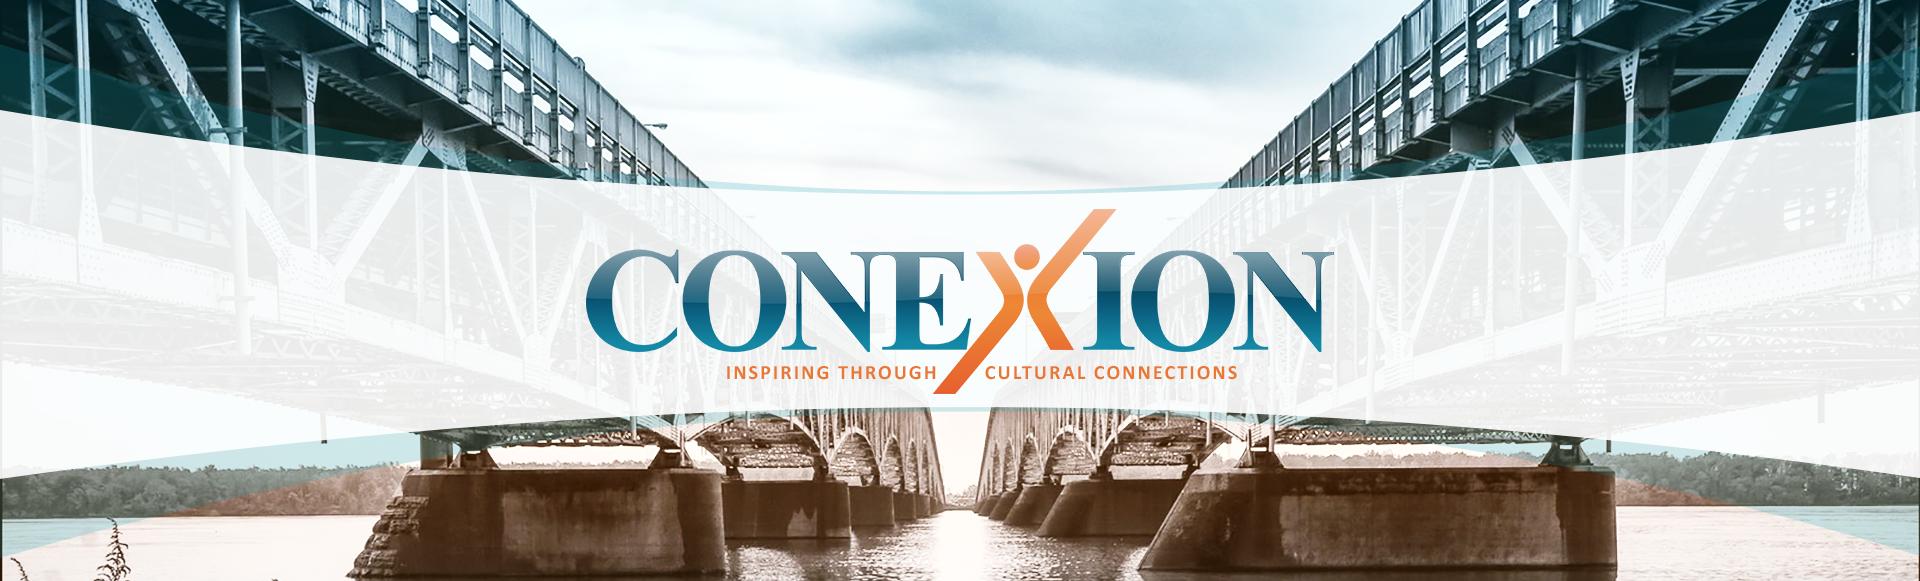 Web Banner Conexion 2